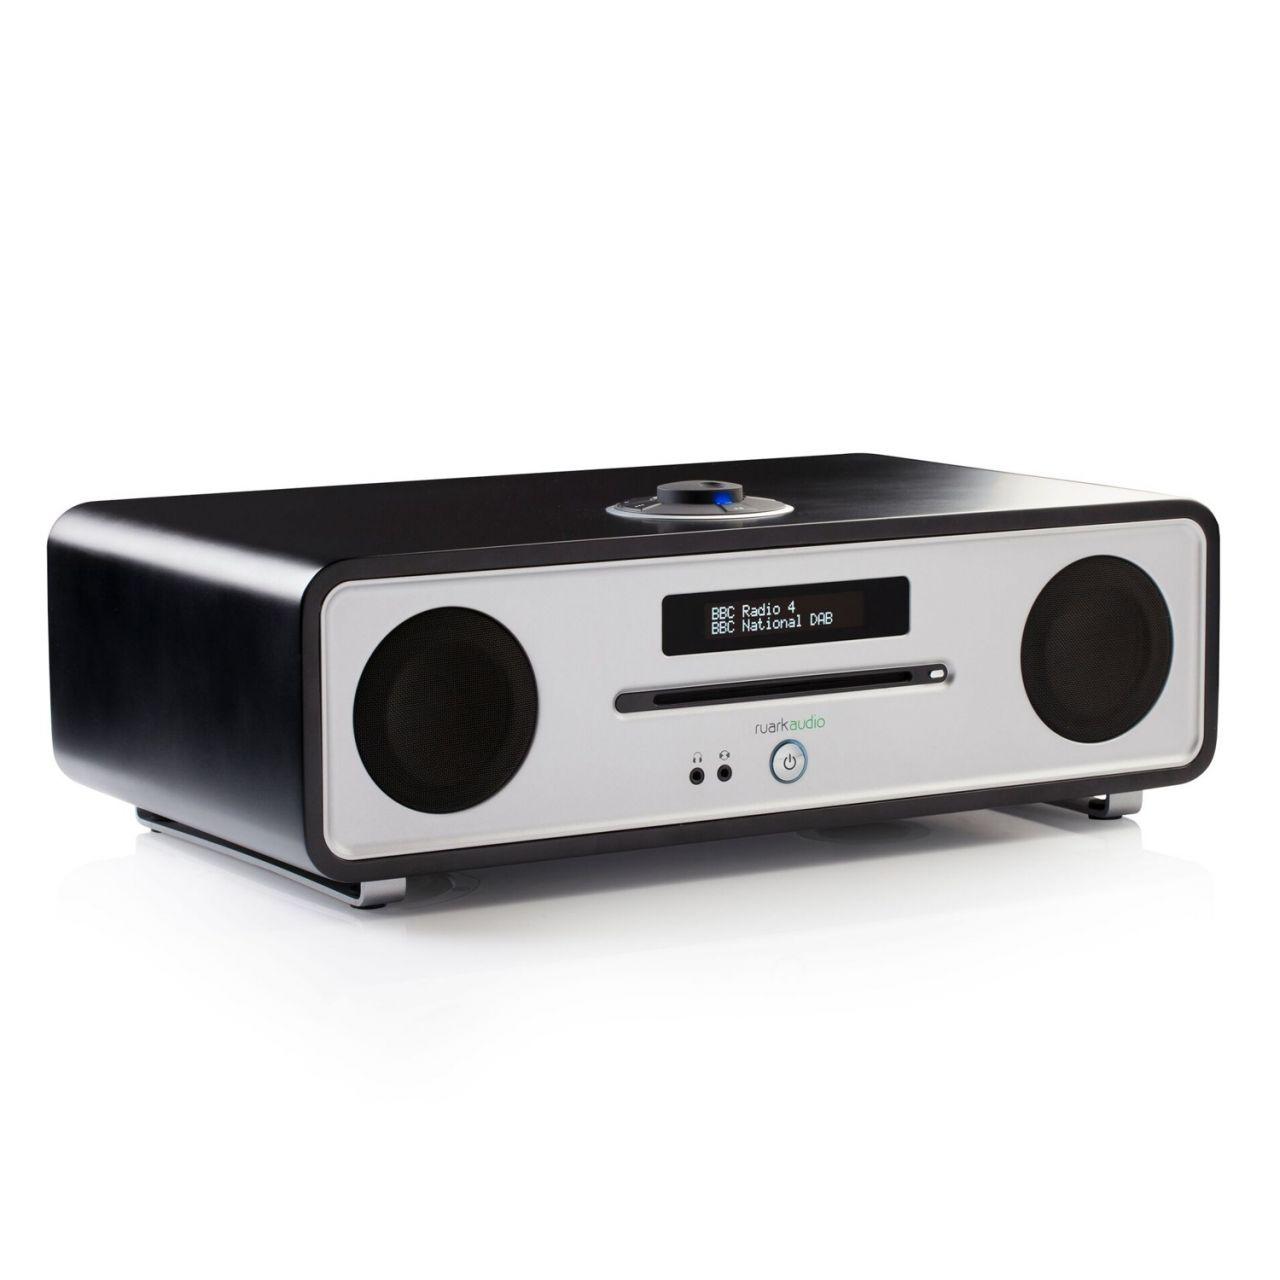 ruark audio - Stereoanlage R4 9029-R4